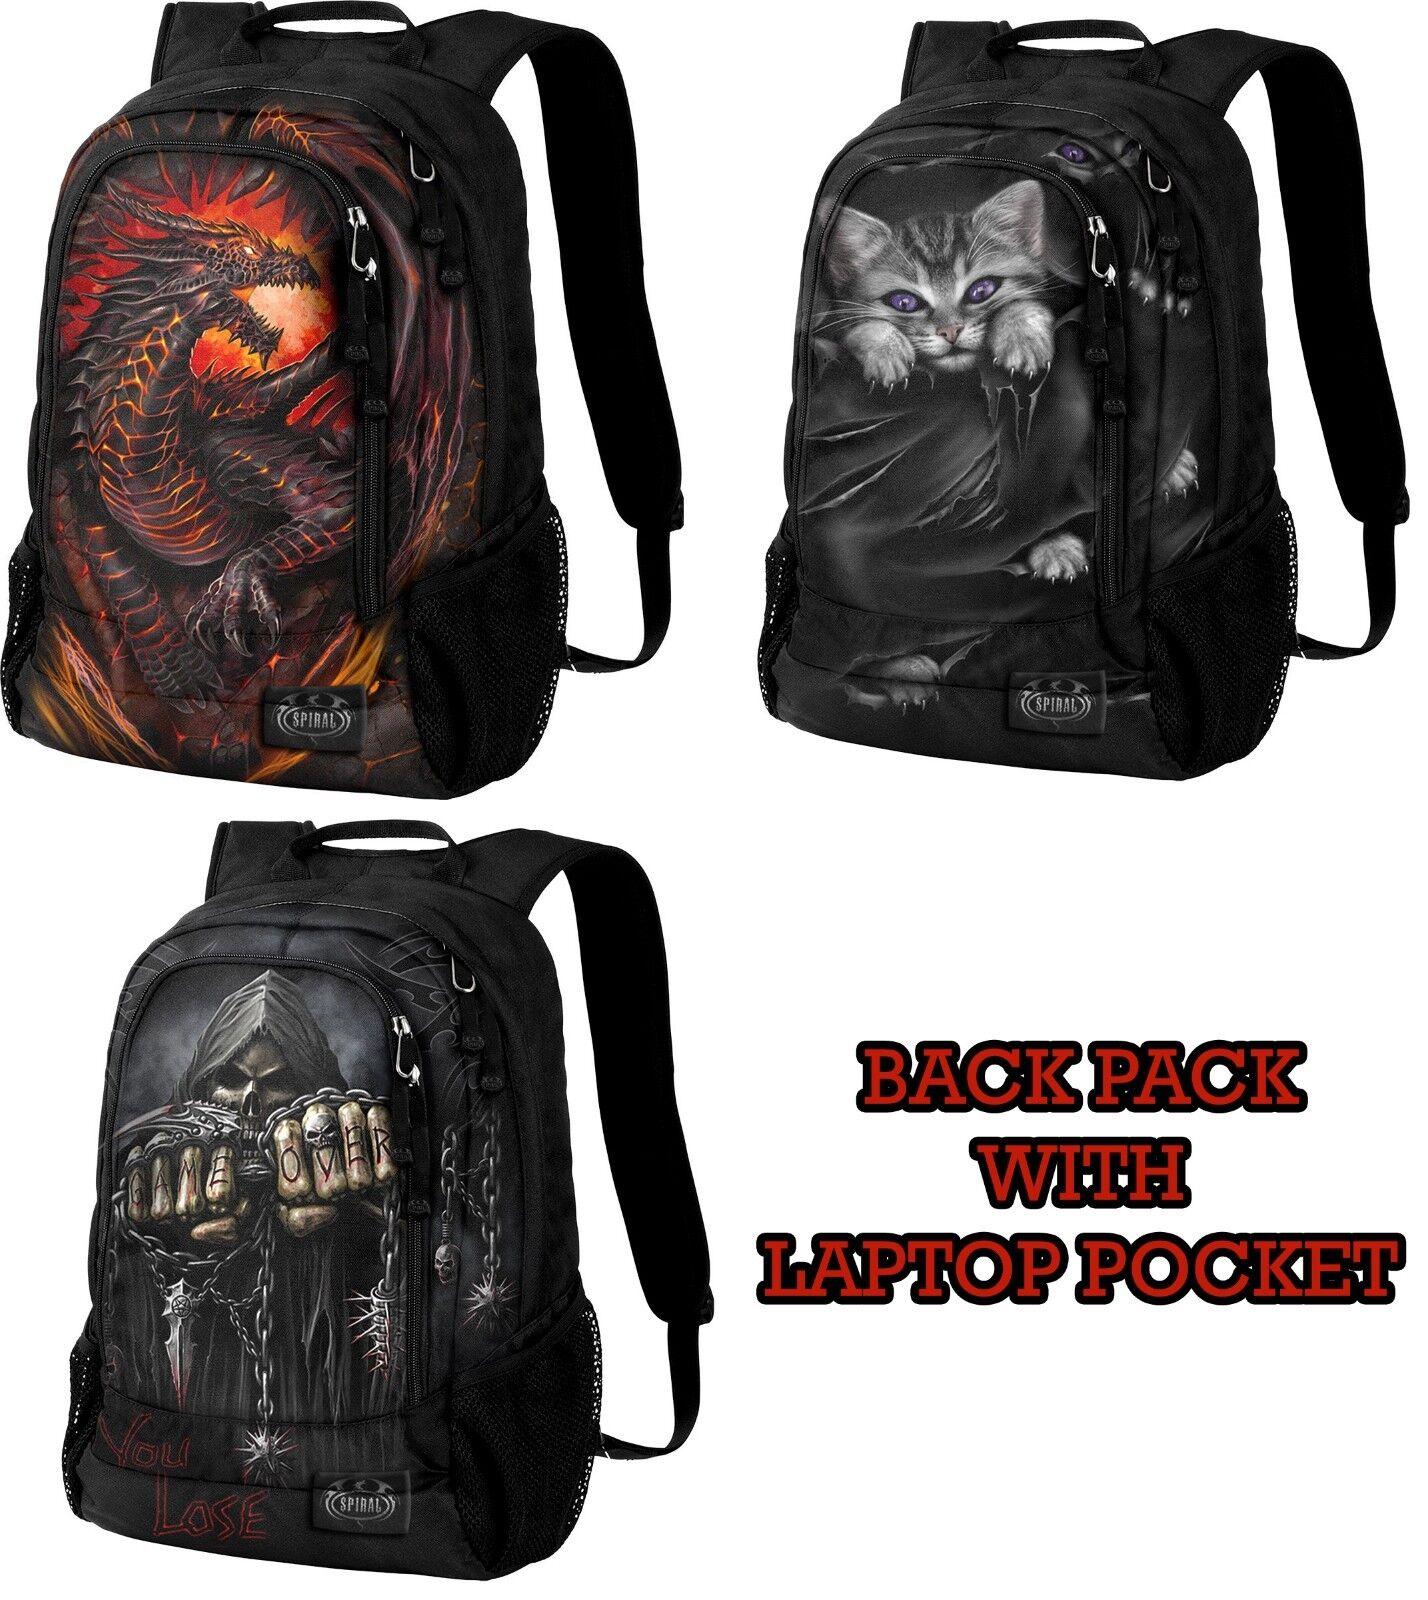 SPIRAL DIRECT BACK PACK WITH LAPTOP POCKET BAG/Unisex/Fire/Rock/Dragon/Cat/Game